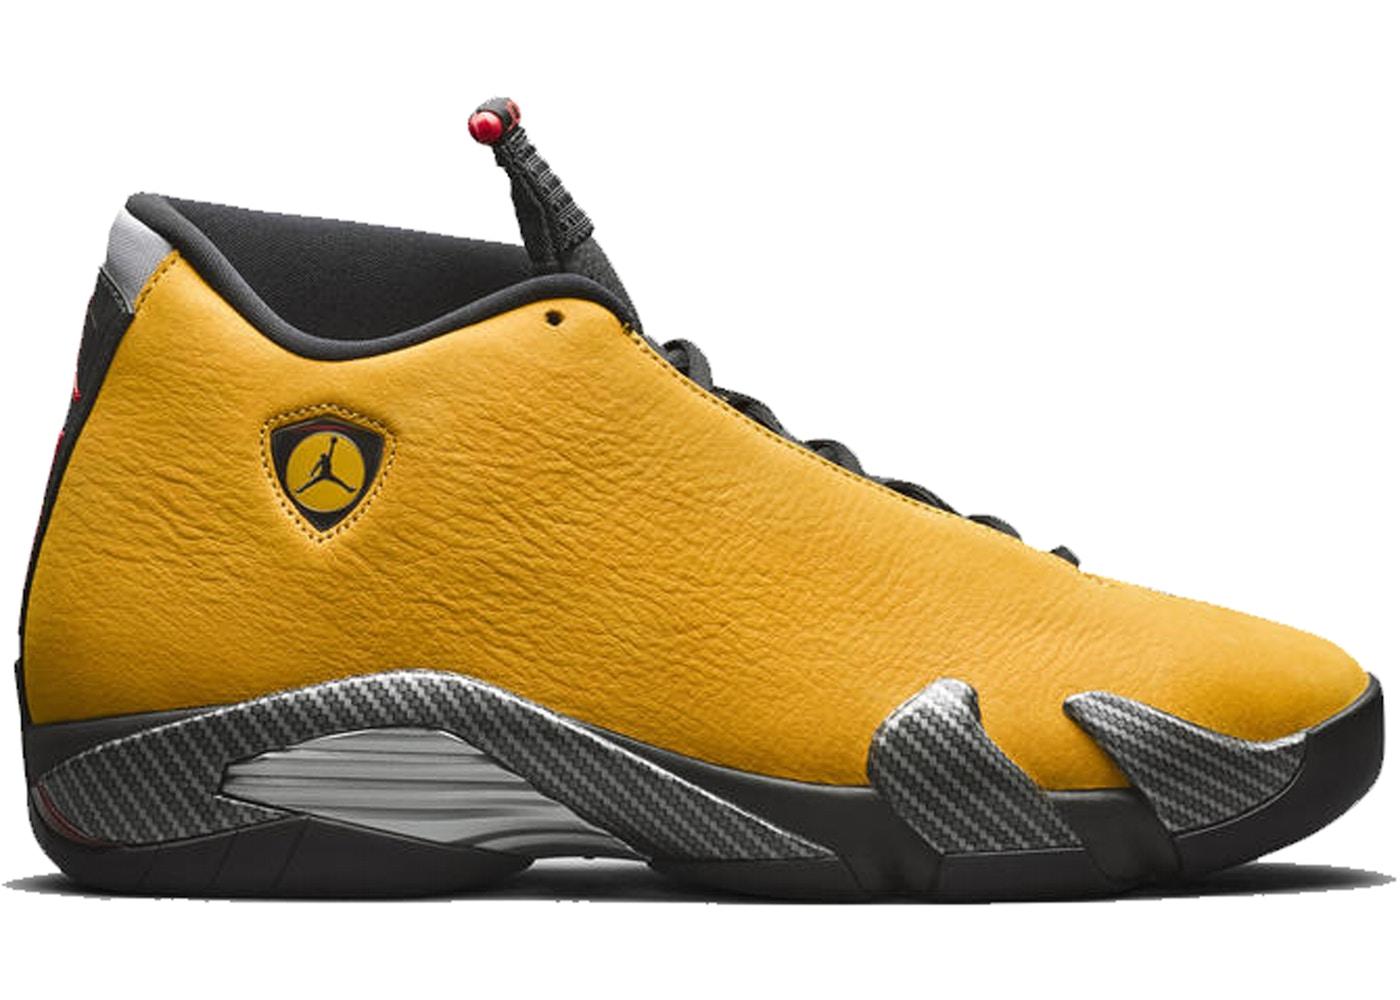 premium selection a4b99 267d3 Jordan 14 Retro Ferrari University Gold • Buy/Sell StockX